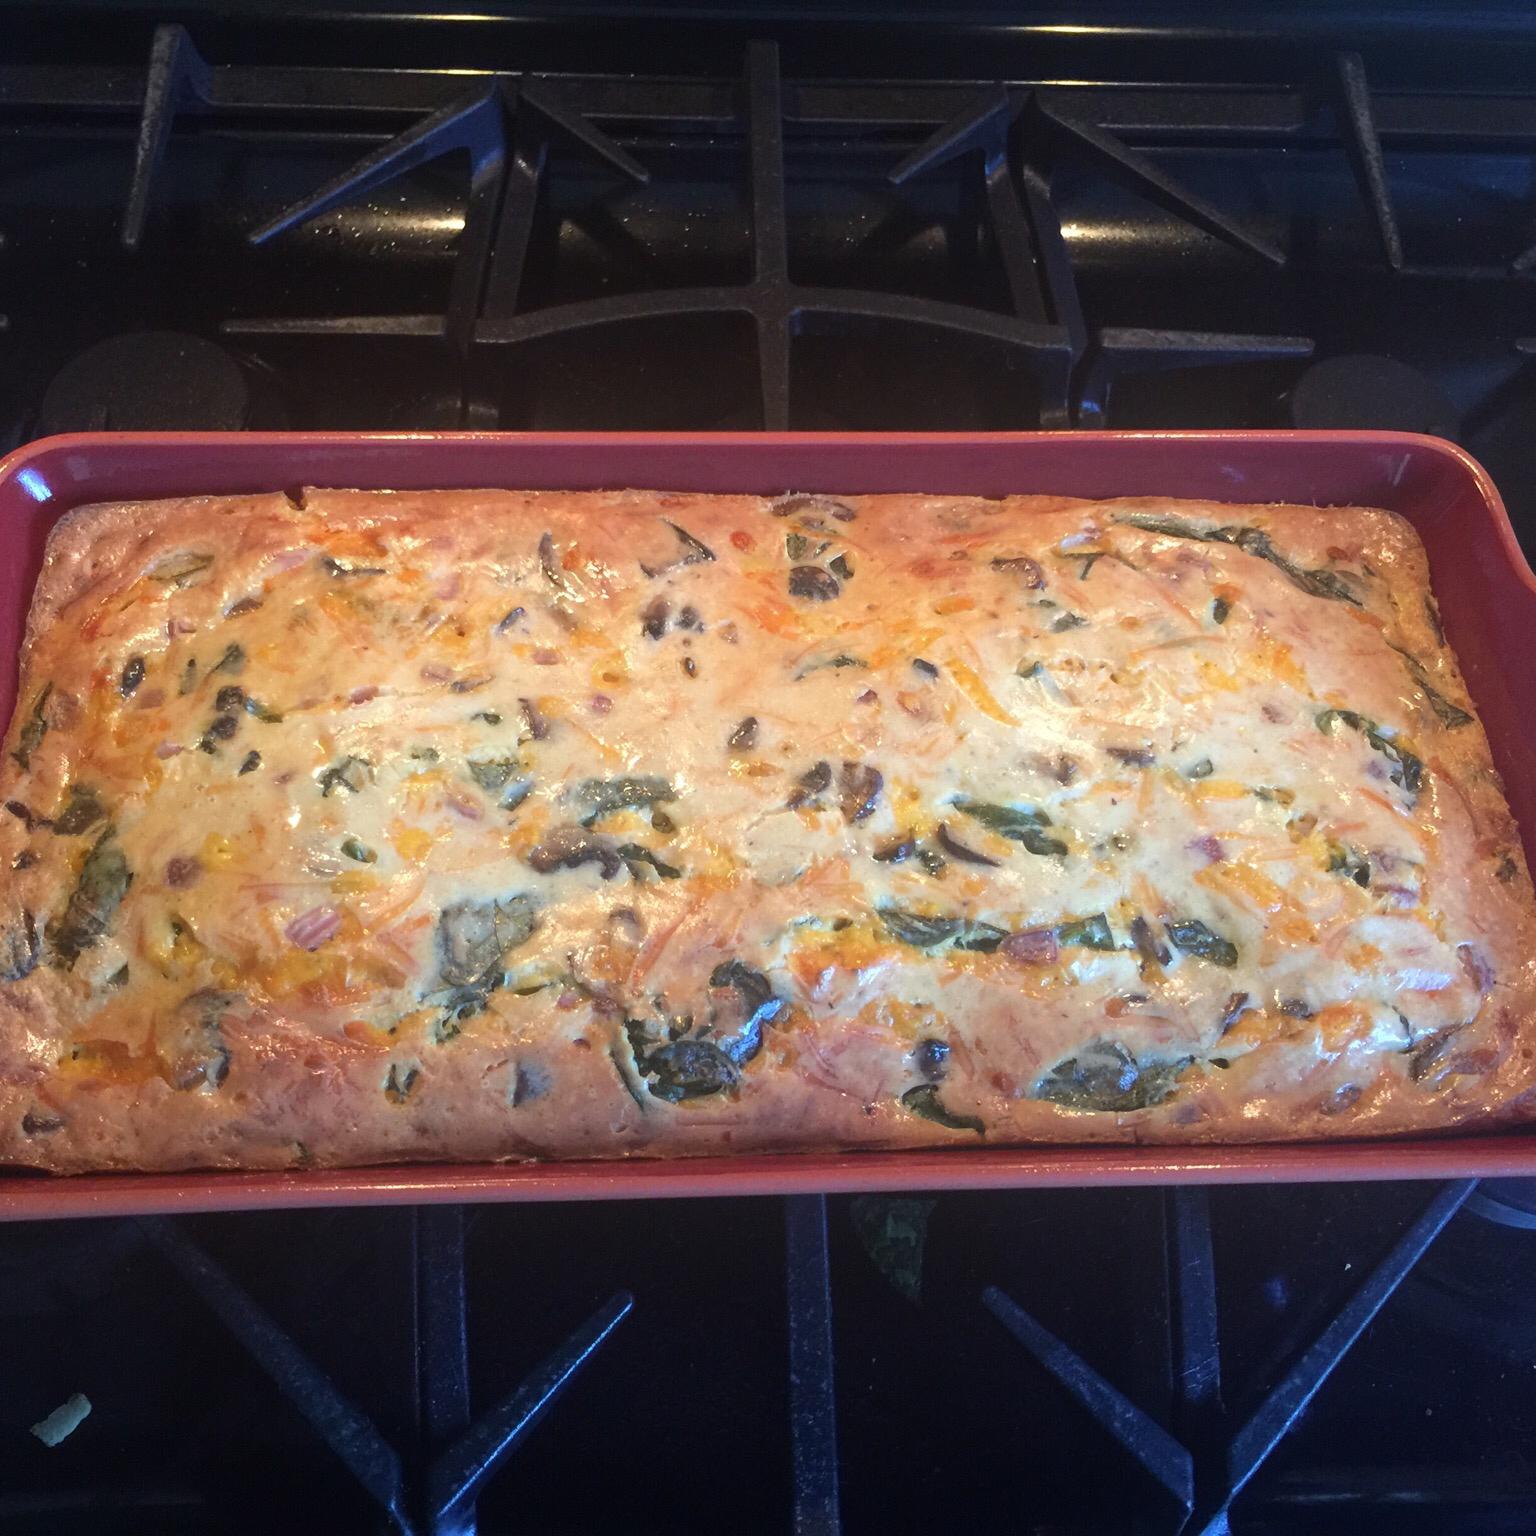 Simple Crustless Spinach and Mushroom Quiche Beth Zillner- Gunier